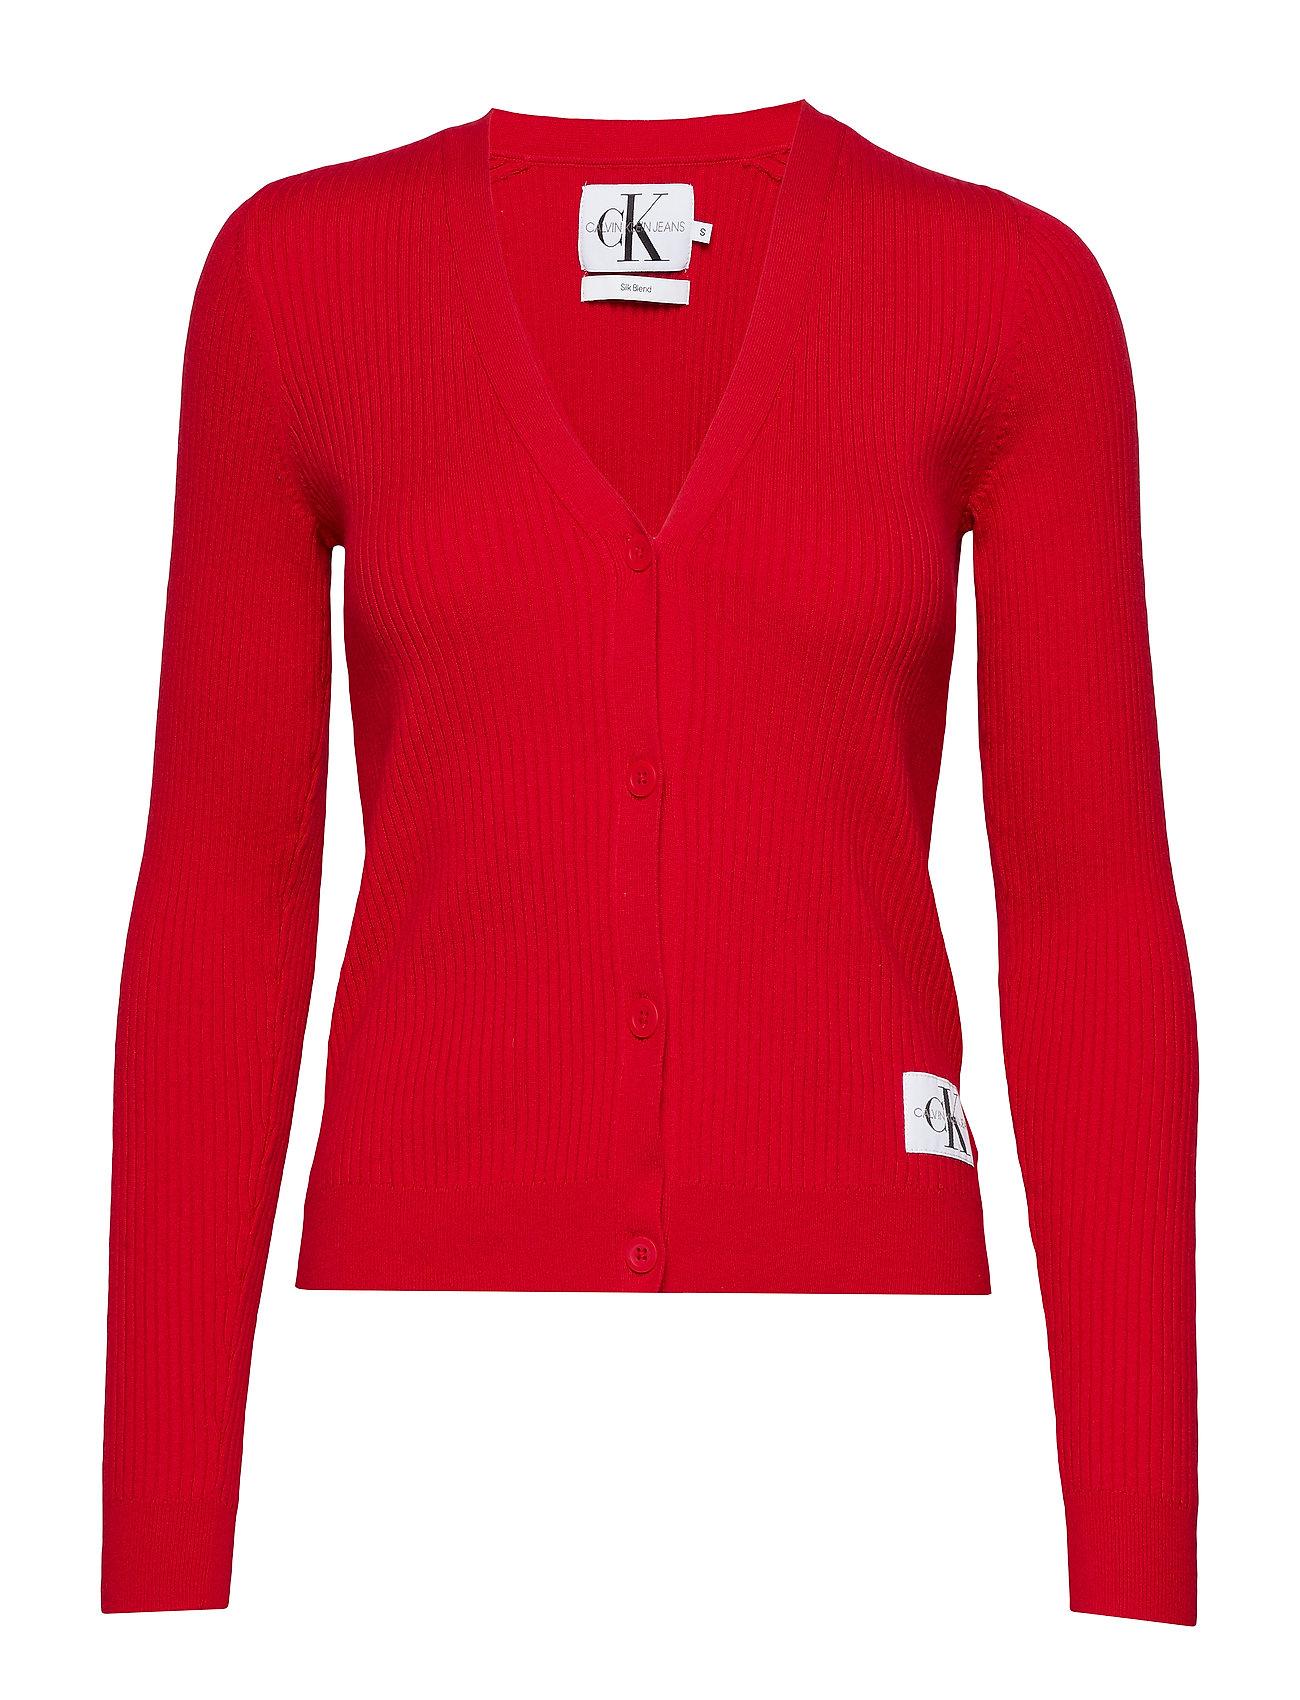 Calvin Klein Jeans ICONIC RIB CARDIGAN, - RACING RED